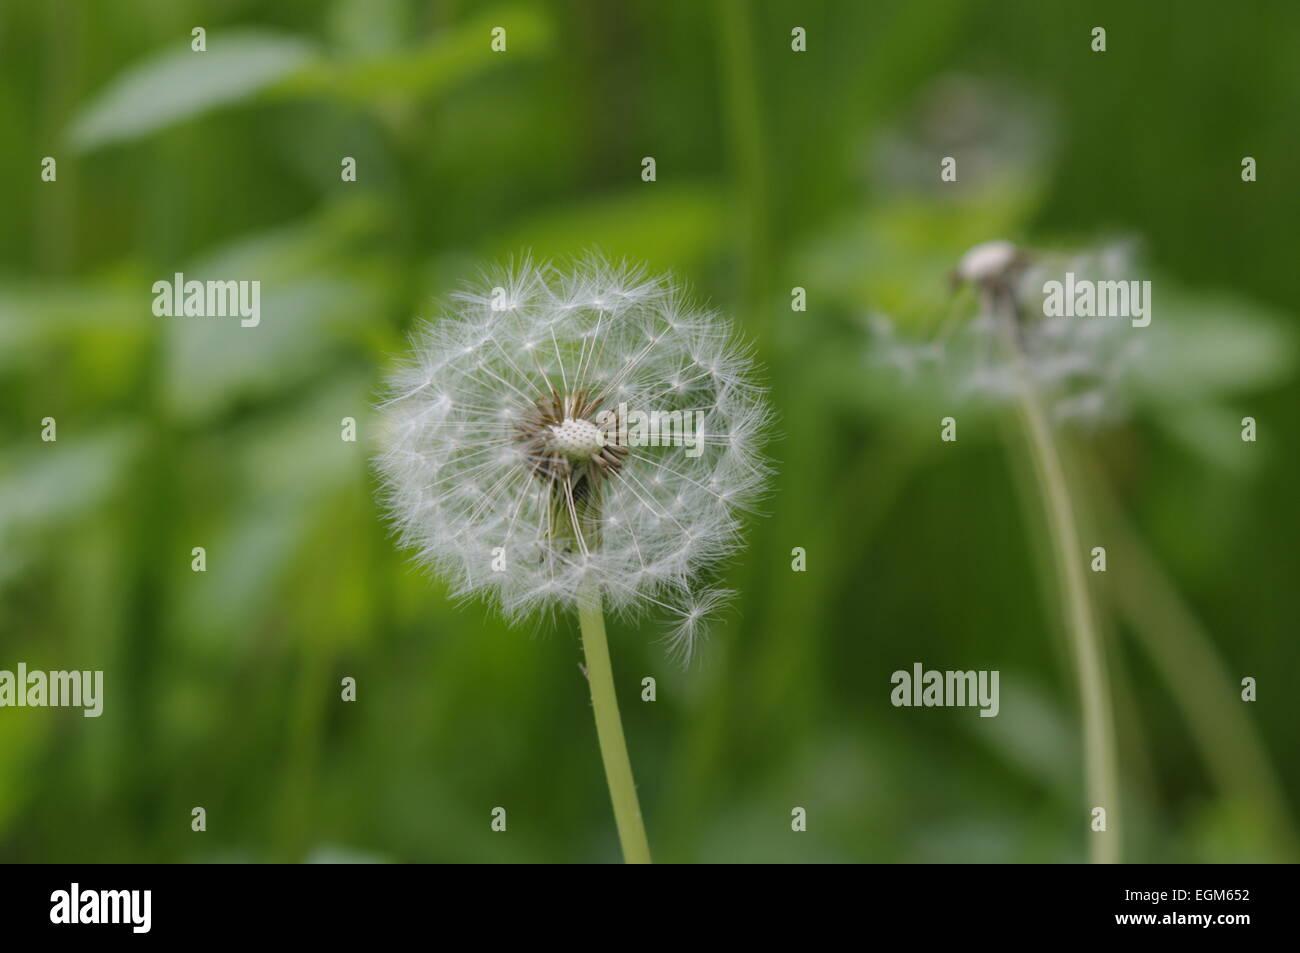 Incomplete dandelions - Stock Image